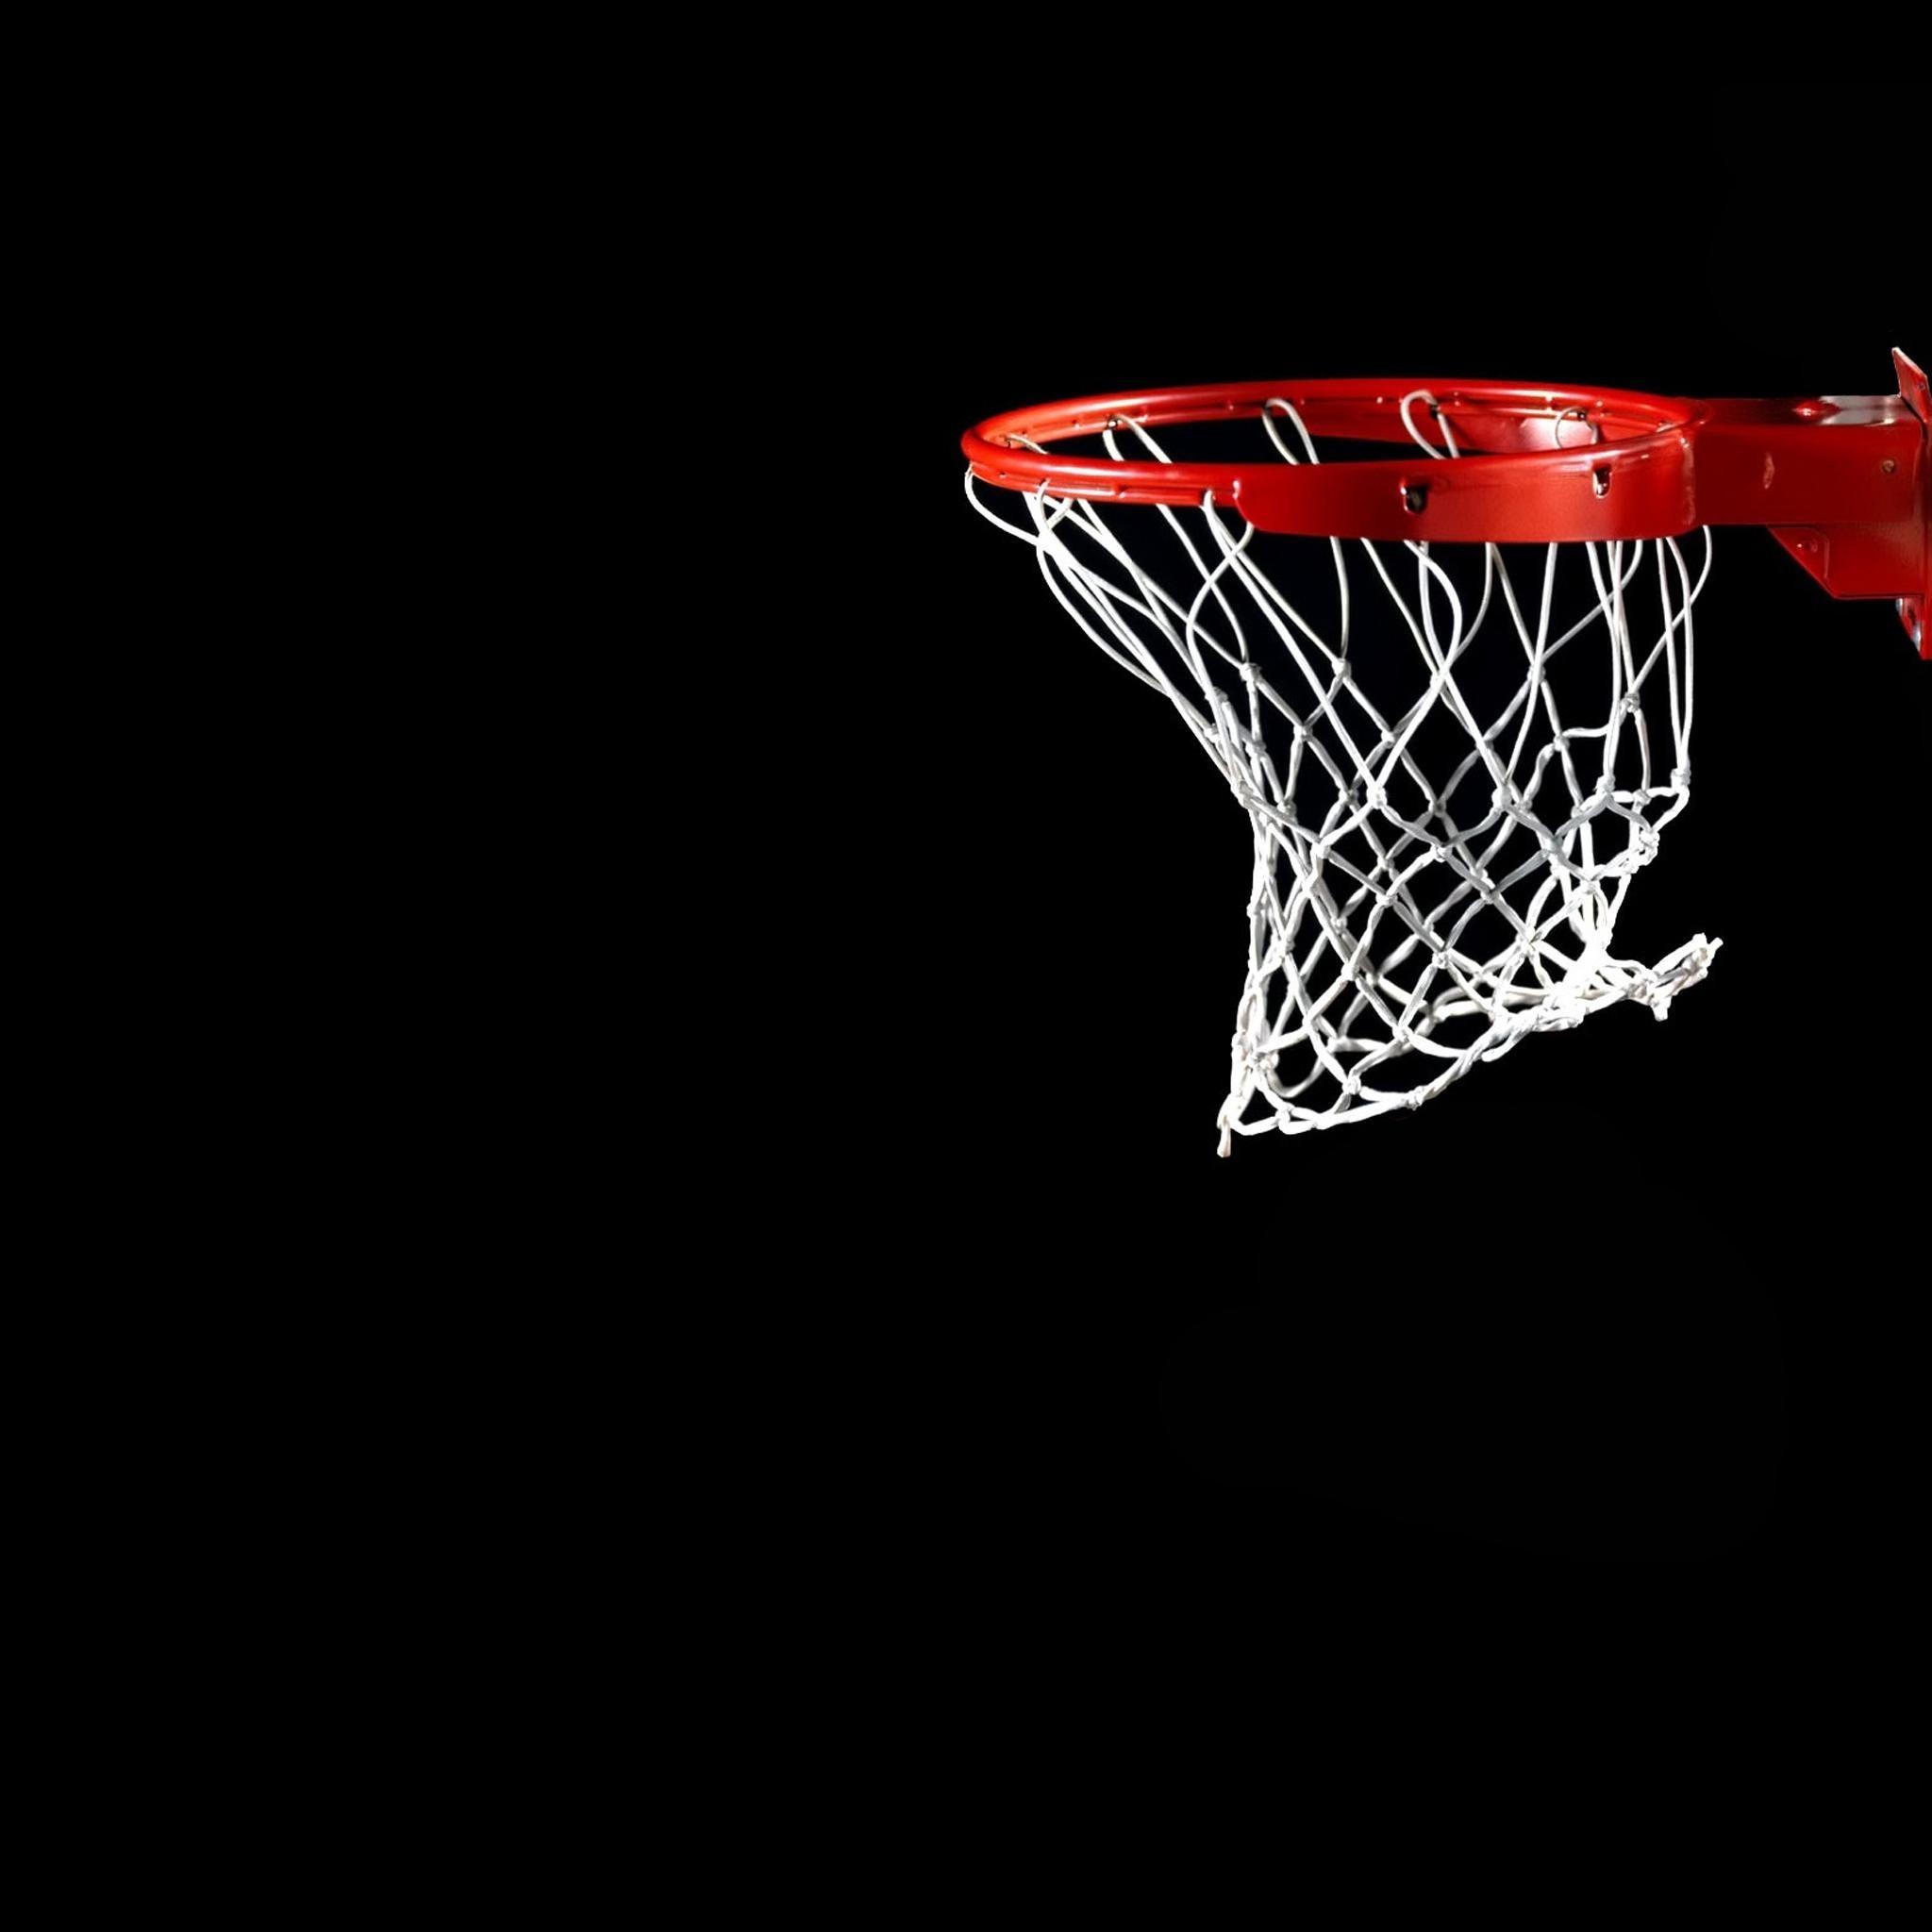 NBA wallpaper 2048x2048